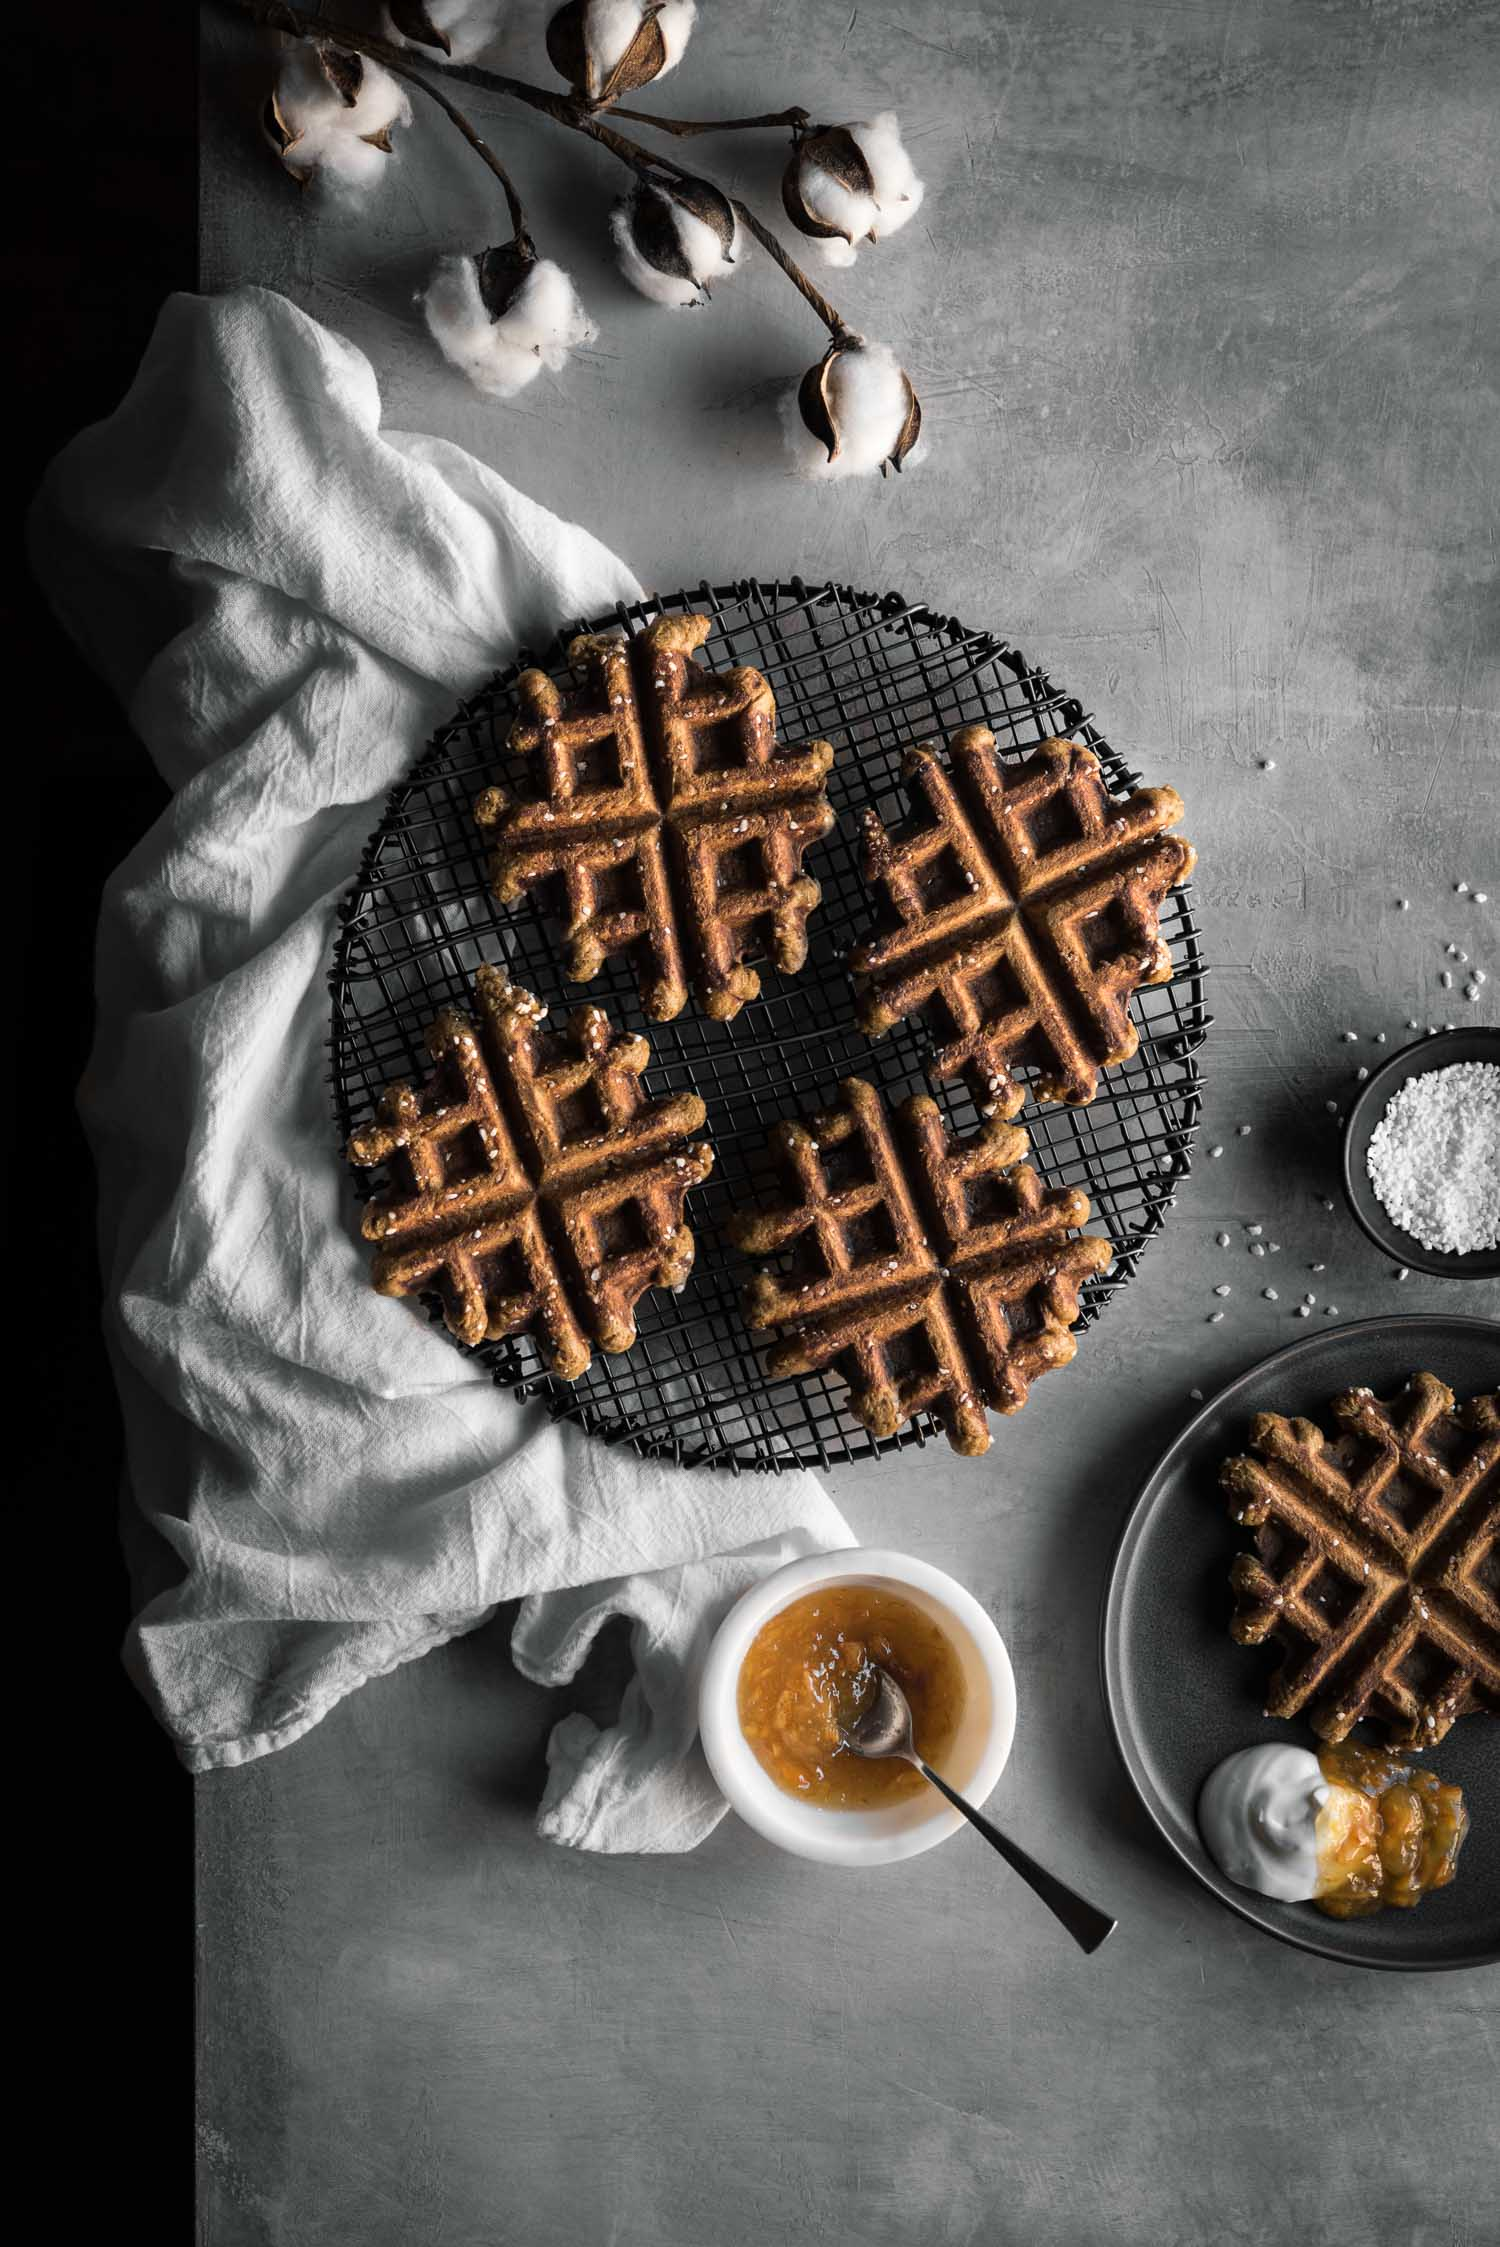 gingerbread belgian liege waffles